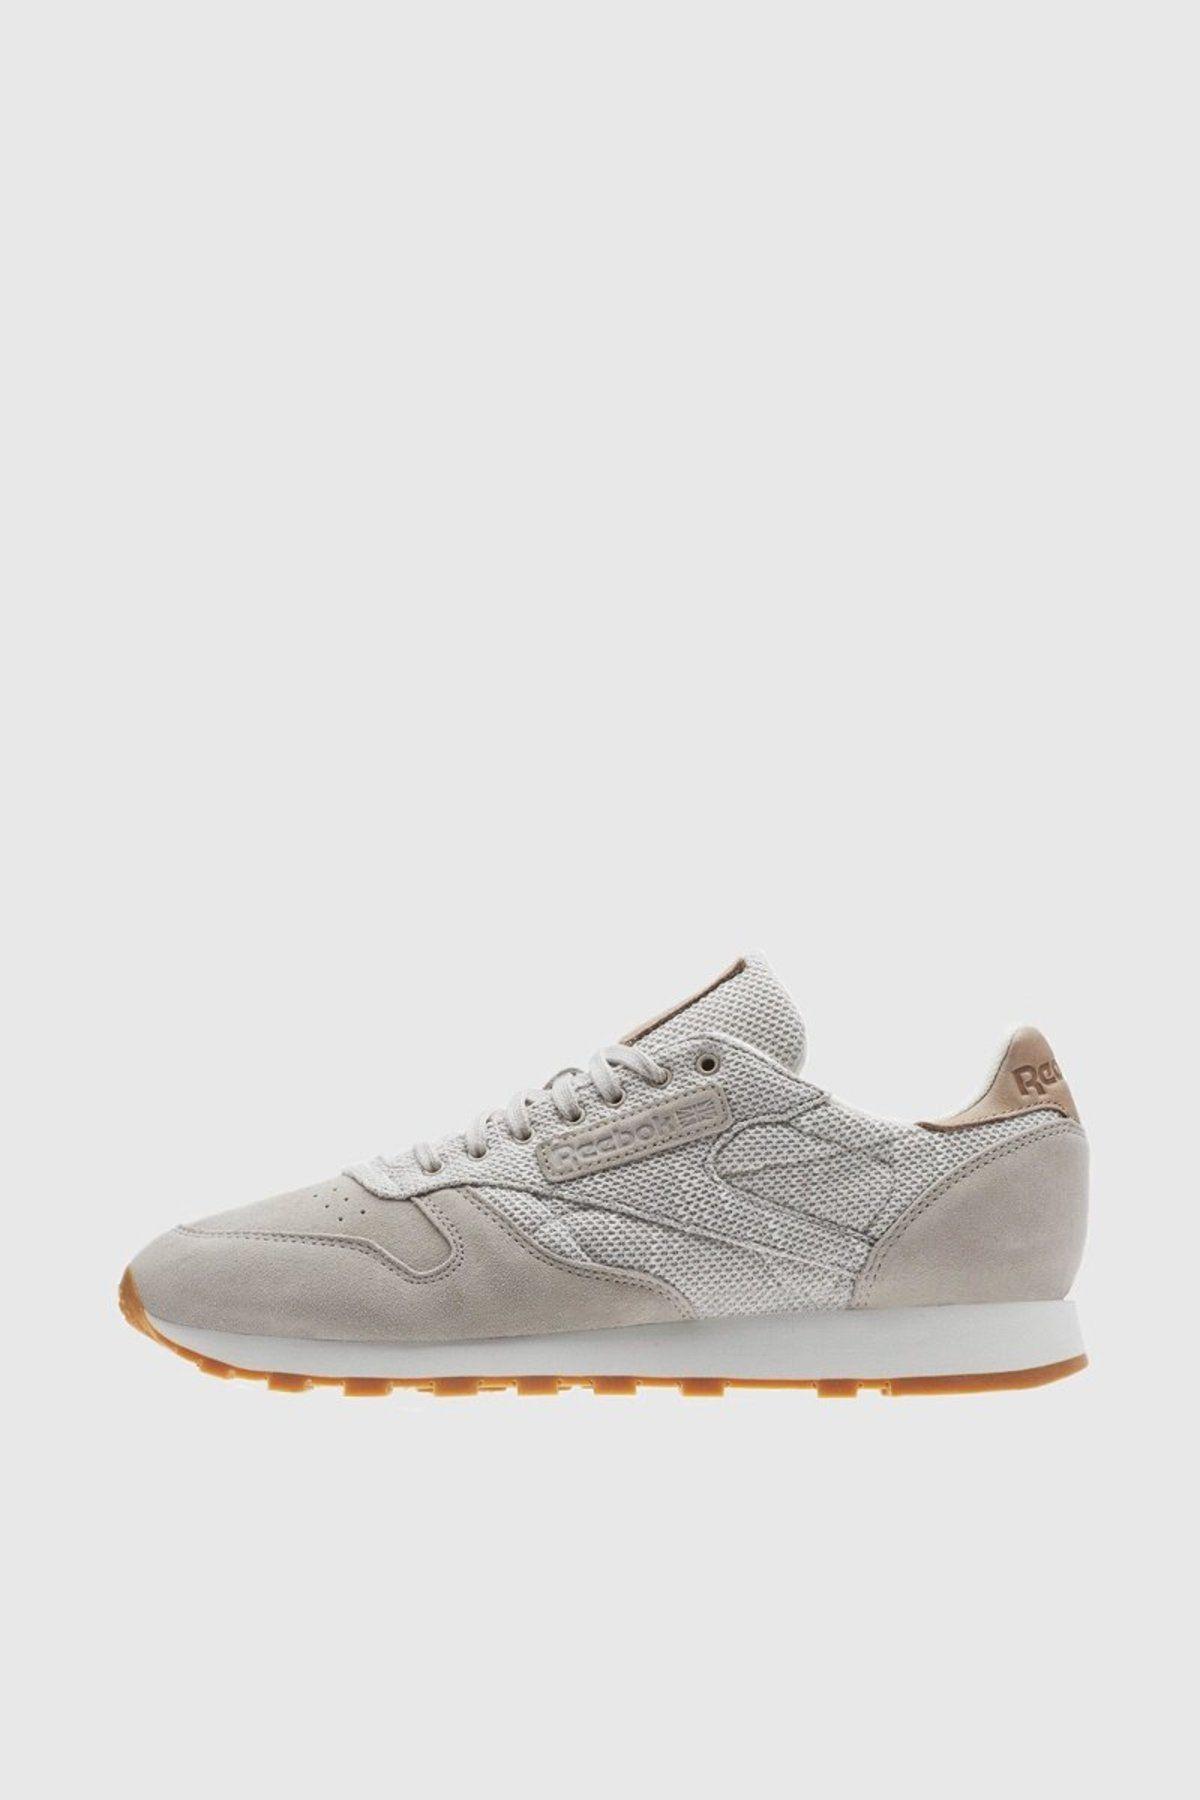 e09299ab3055f Reebok Classic Leather EBK Sneakers - Sandstone   Chalk   Gum